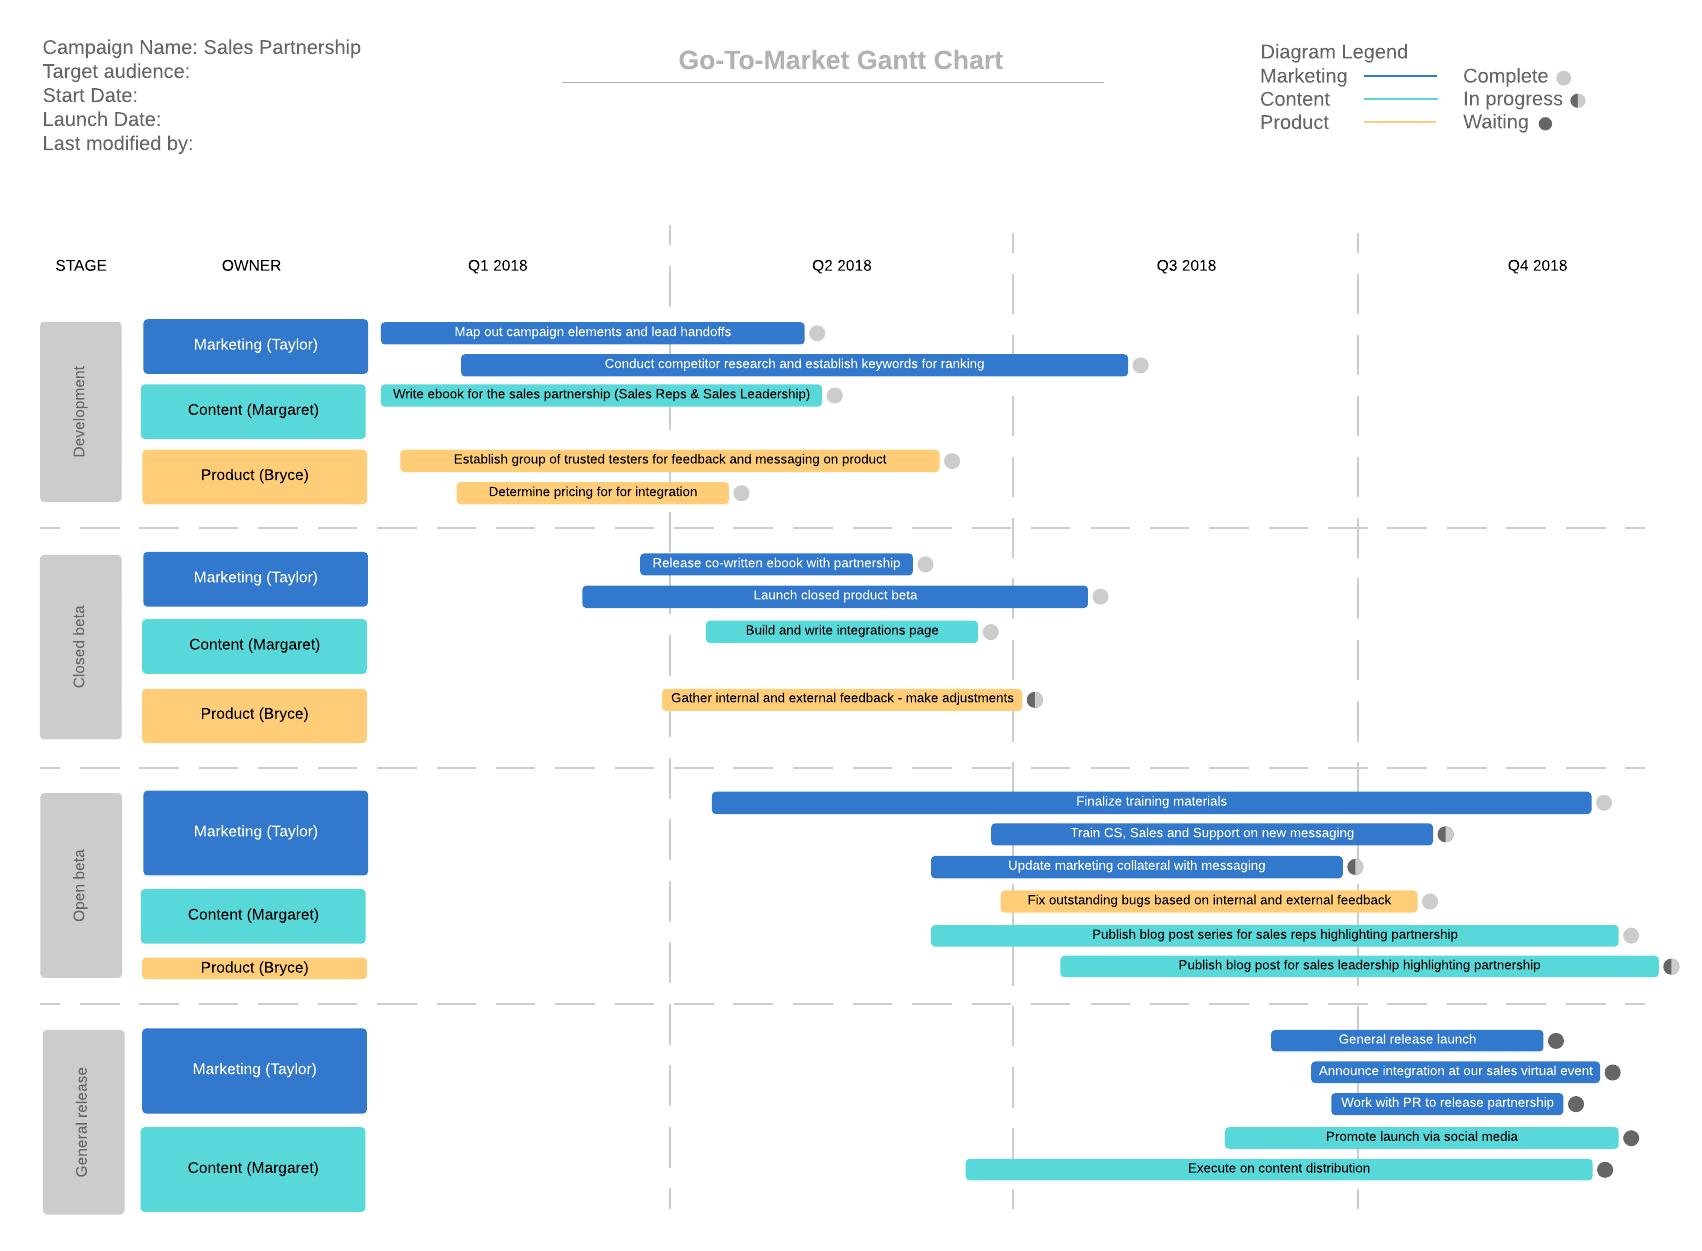 go-to-market Gantt chart